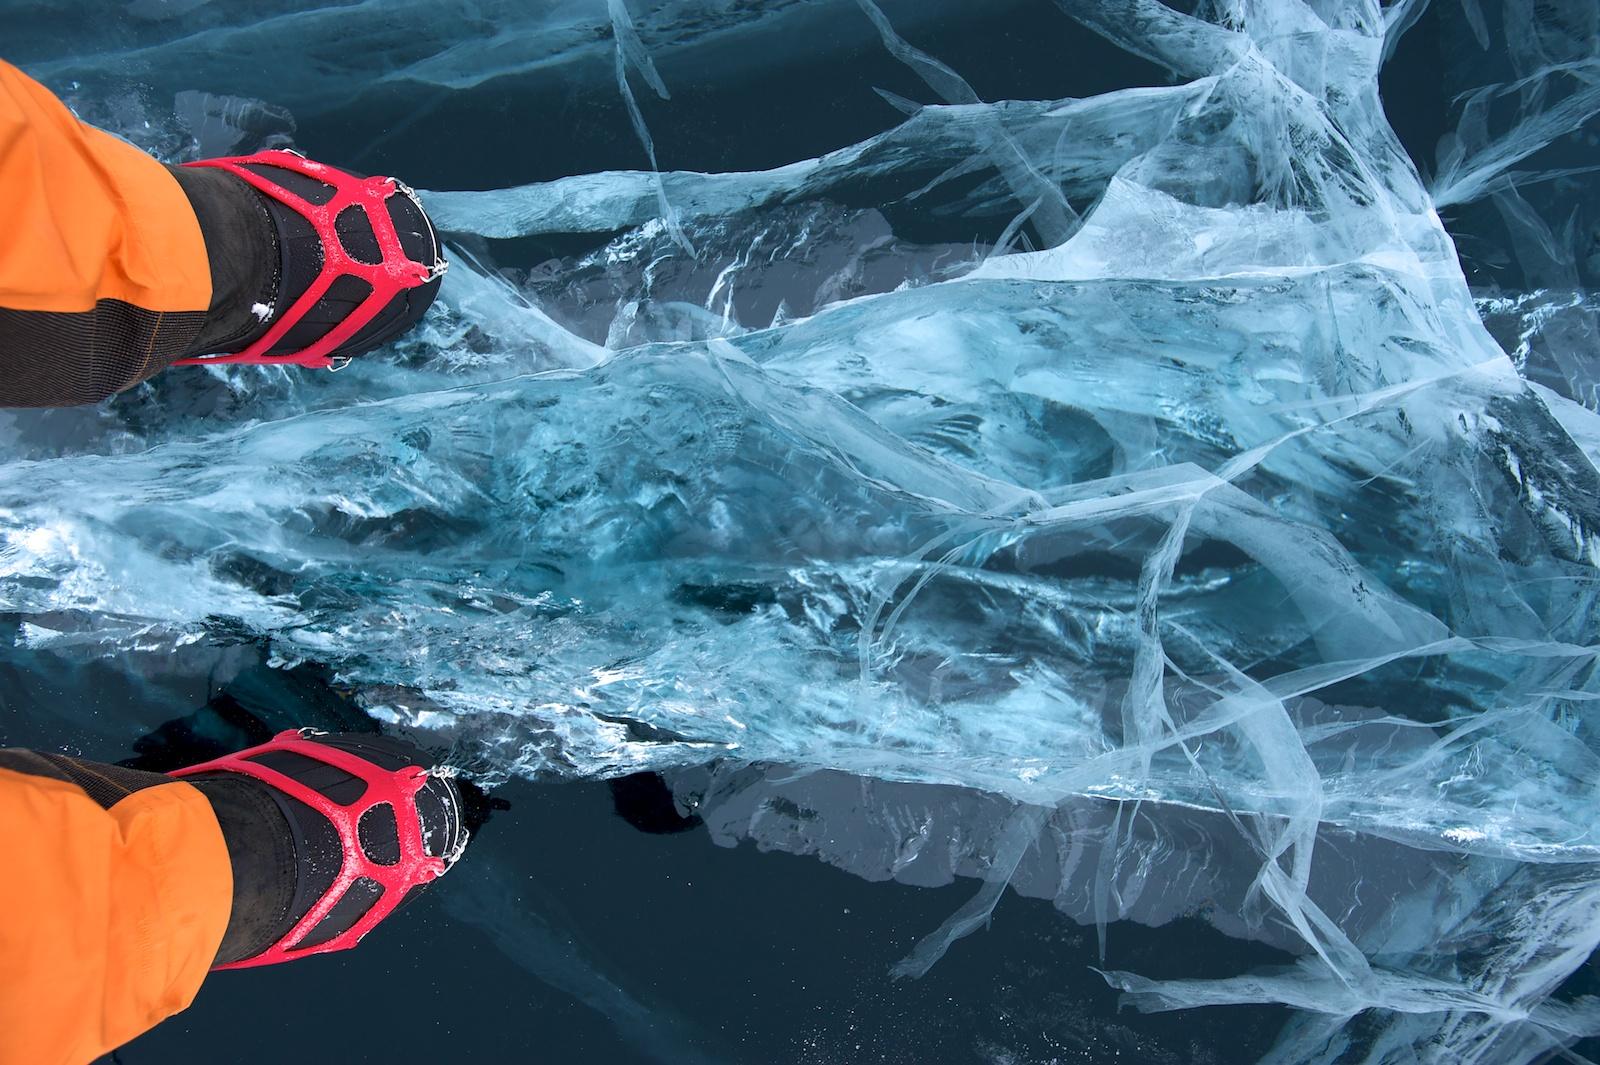 При какой температуре встает лед на реке